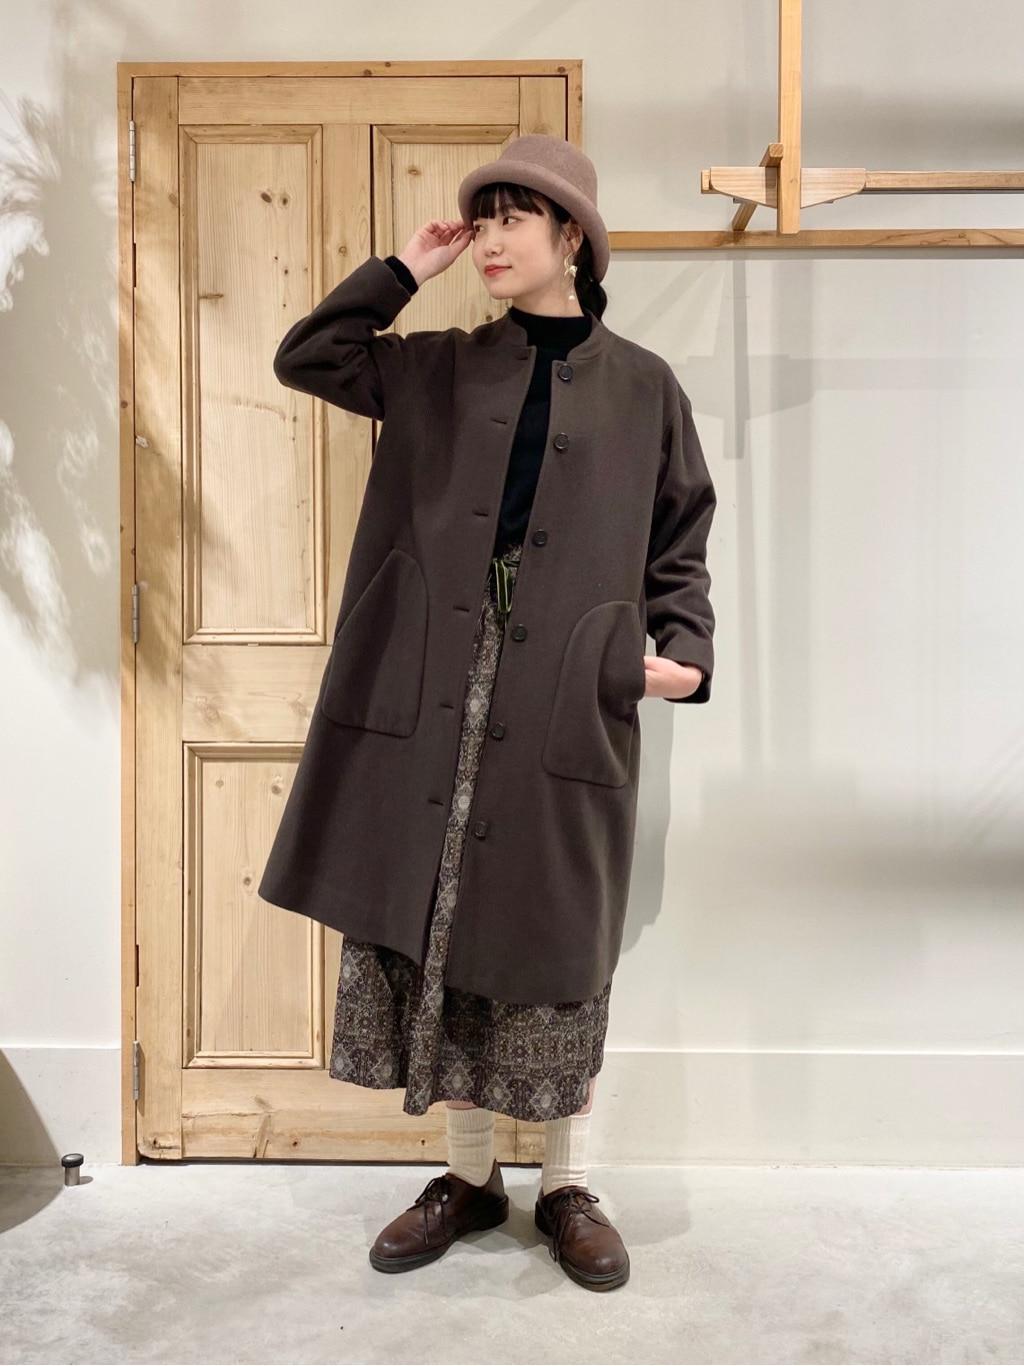 Malle chambre de charme 調布パルコ 身長:167cm 2020.10.15